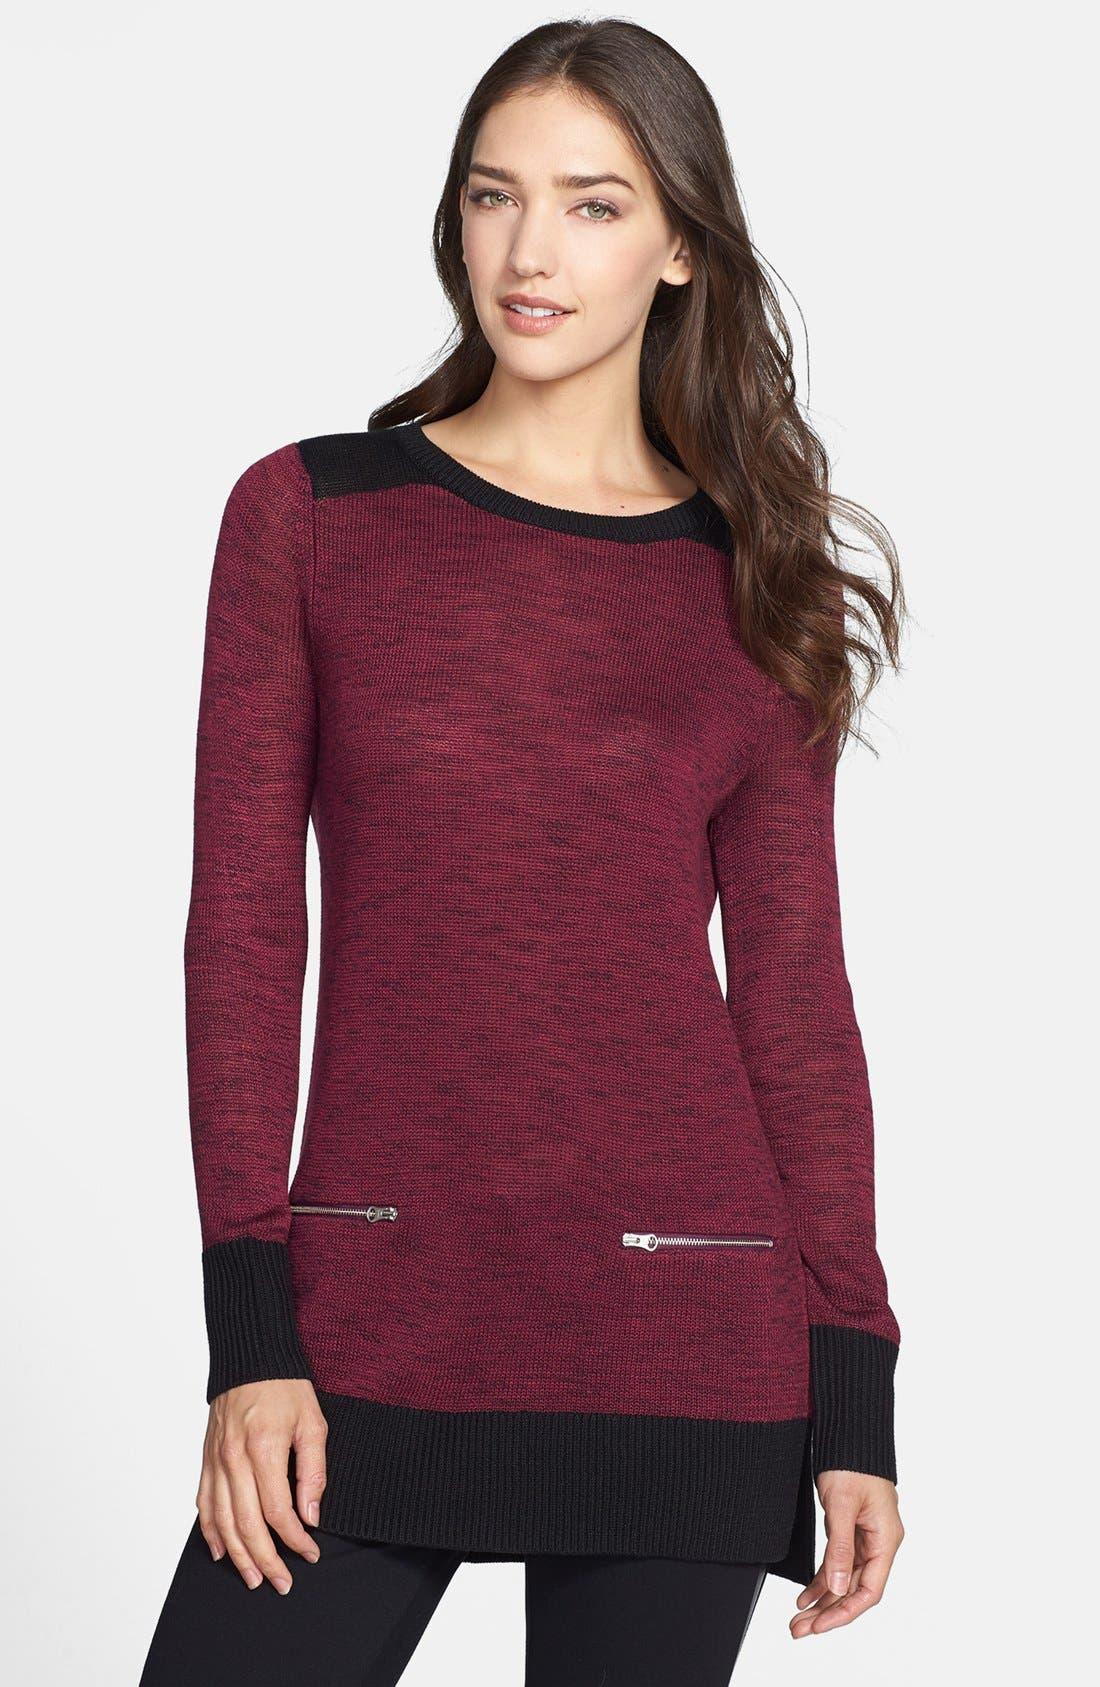 Main Image - Halogen® Zip Pocket Tunic Sweater (Regular & Petite Focus)